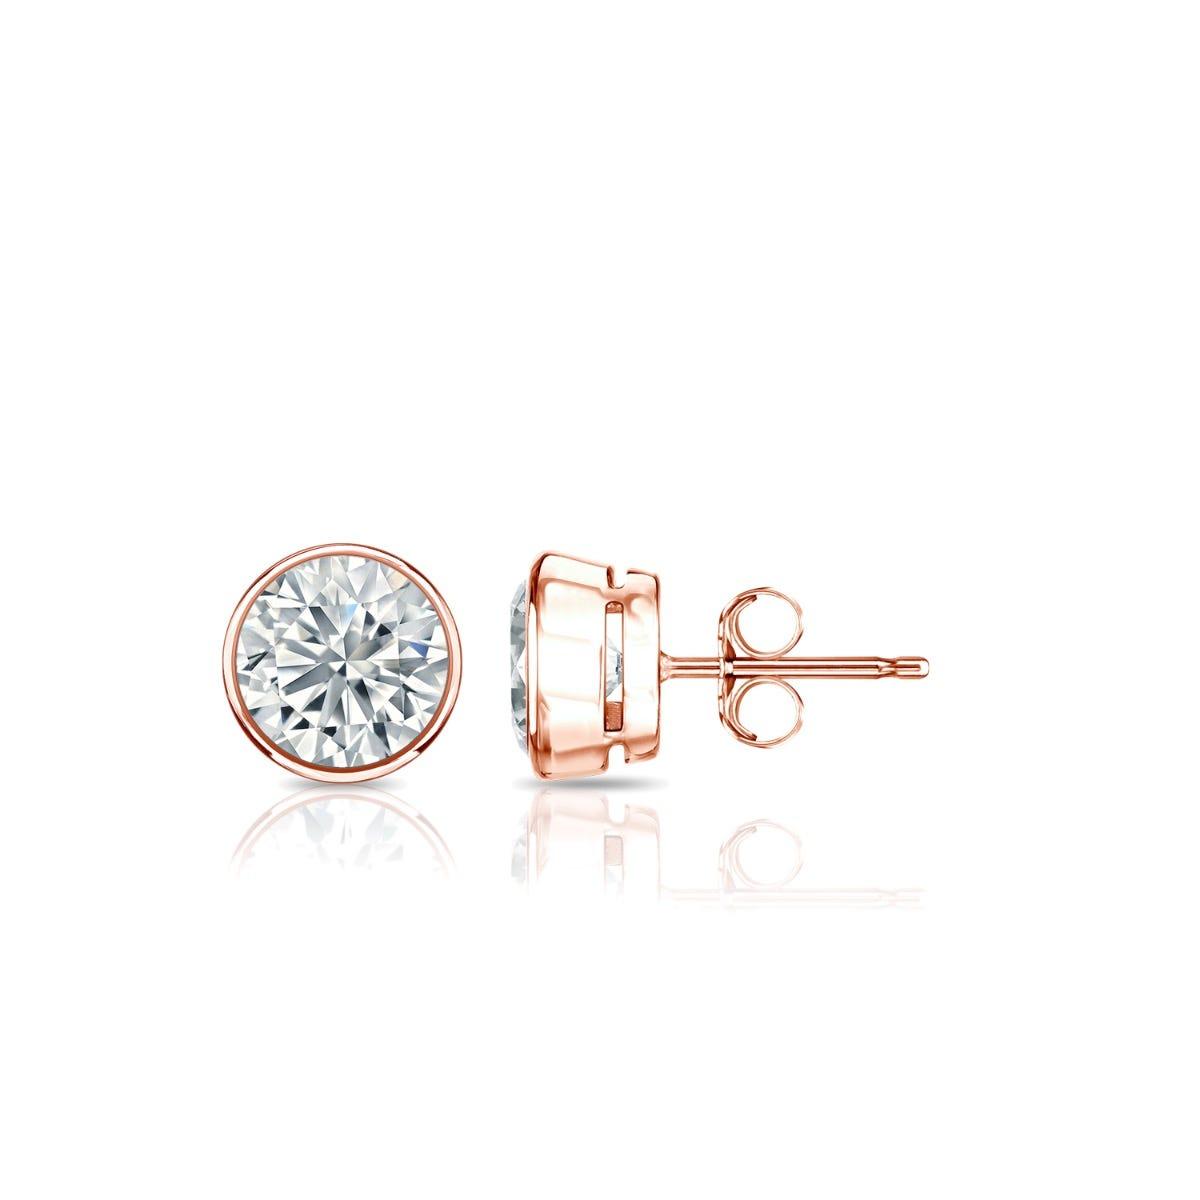 Diamond Round Bezel-Set 5/8ctw. Solitaire Stud (IJ-SI2) Earrings in 14K Rose Gold